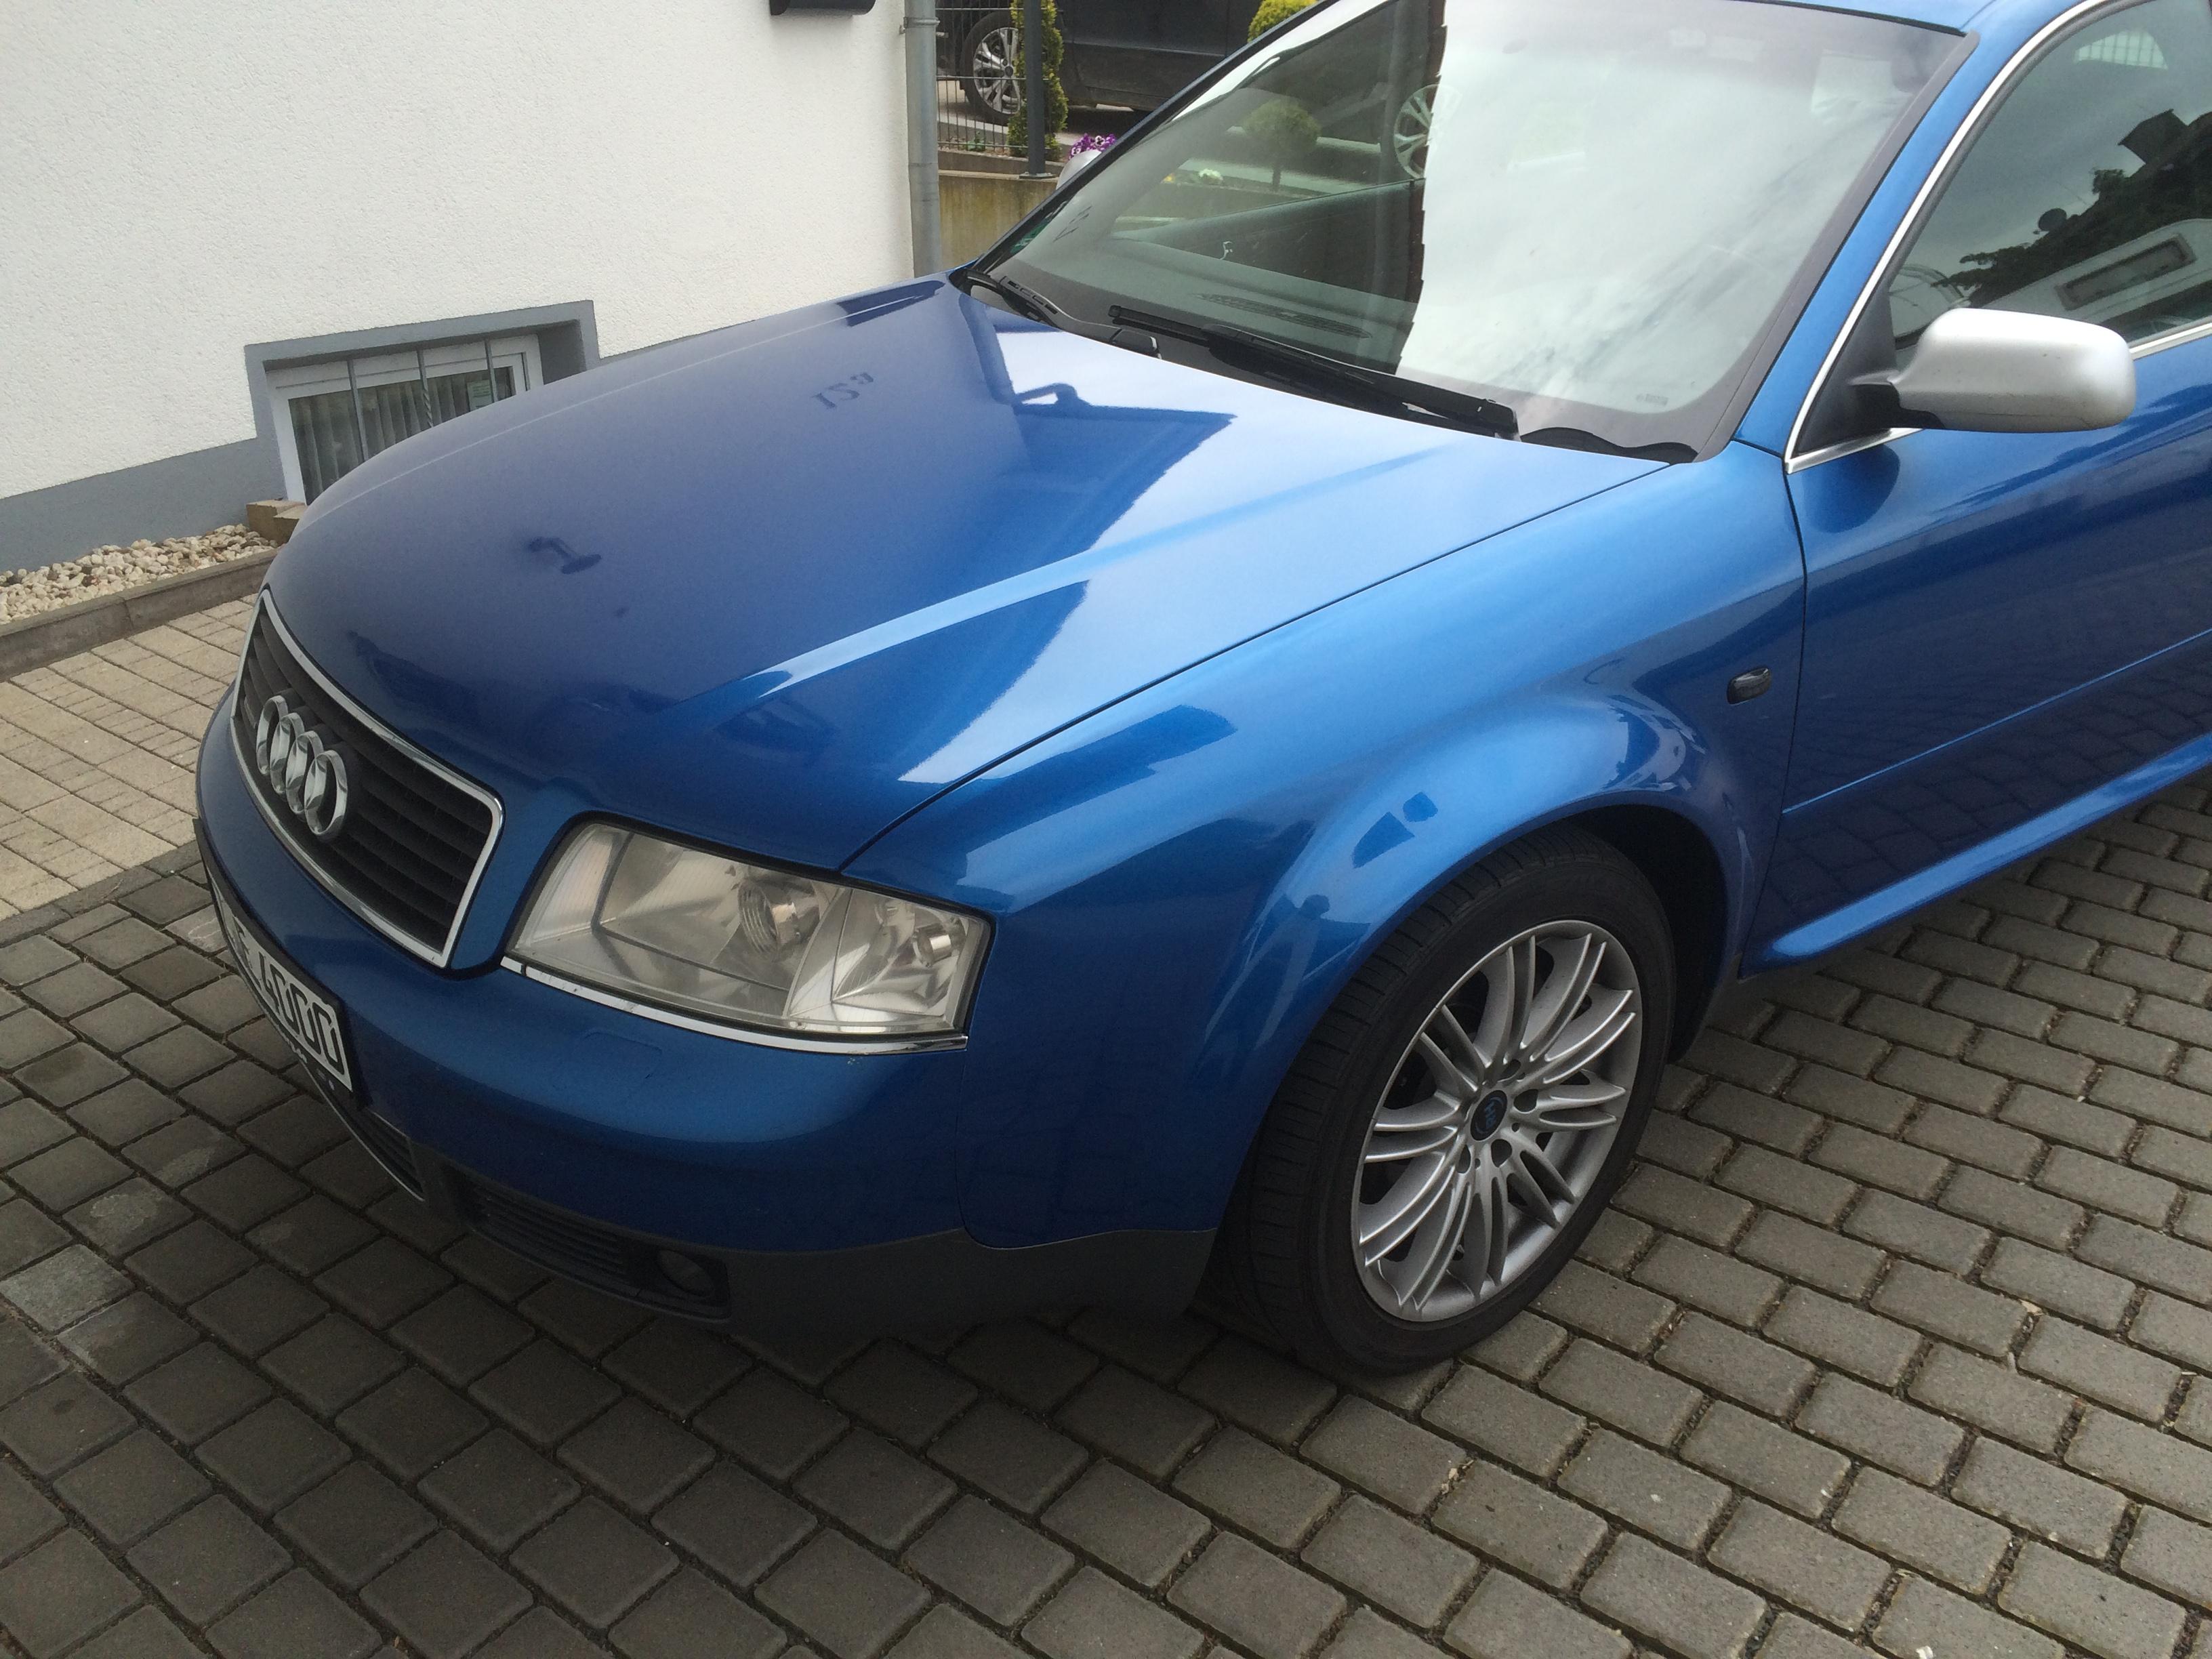 Fahrzeugbeispiel Chiptuning Audi A4 (2)